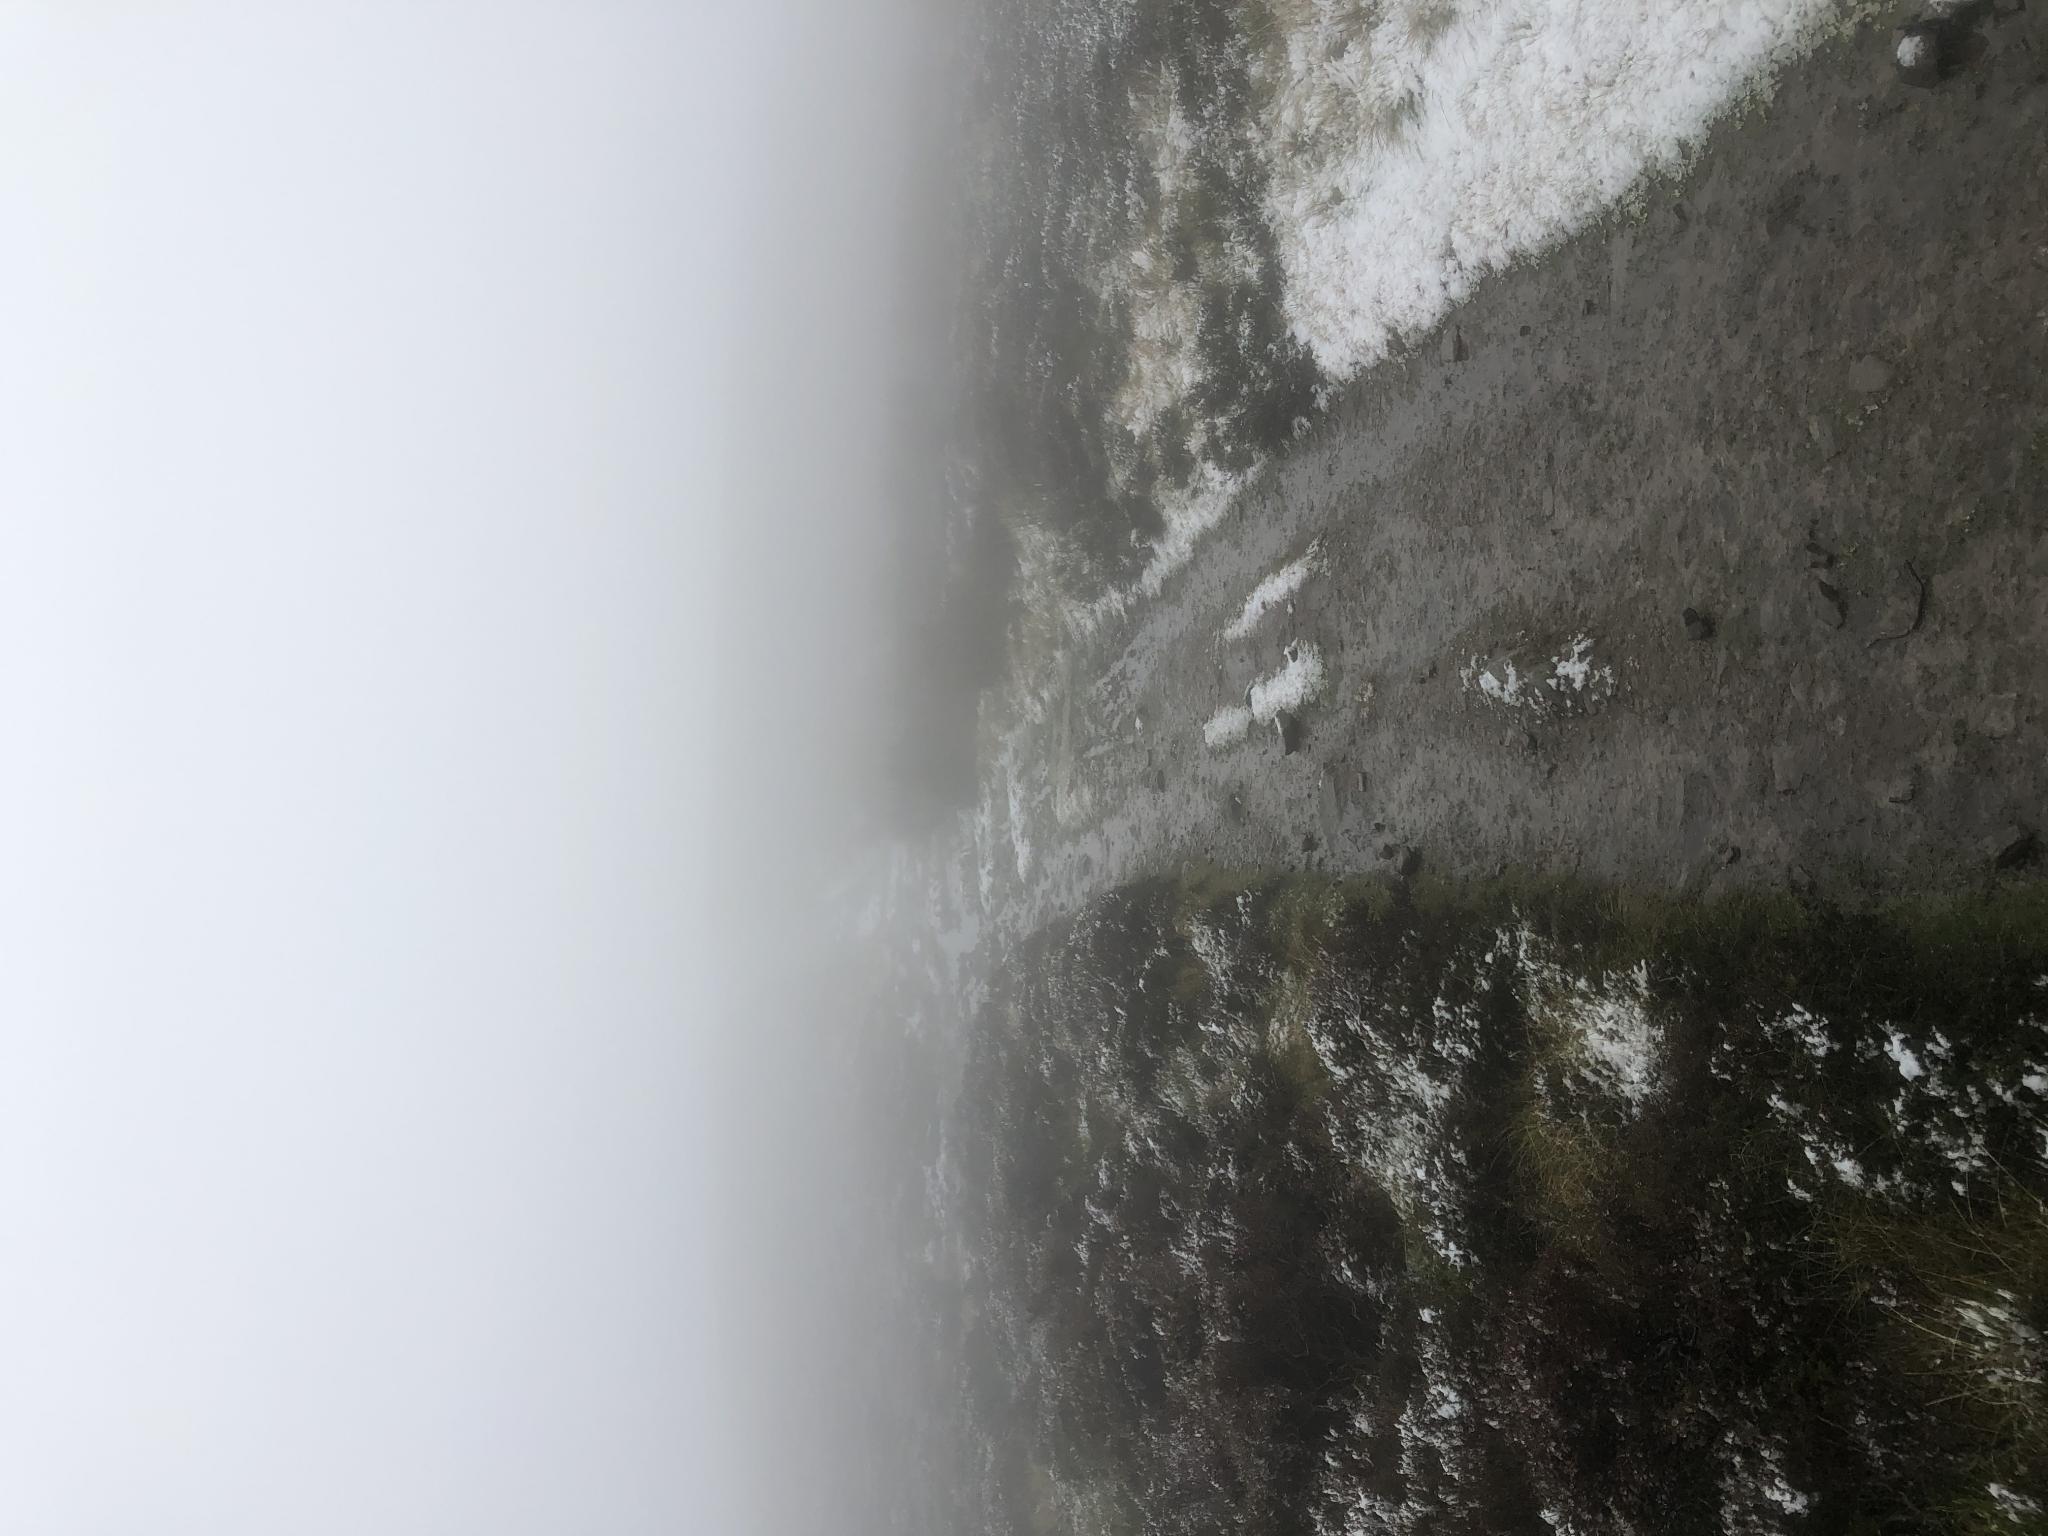 Offas Dyke in December-07c0fcad-ce3d-4c51-a2f8-c8161689c006-jpg